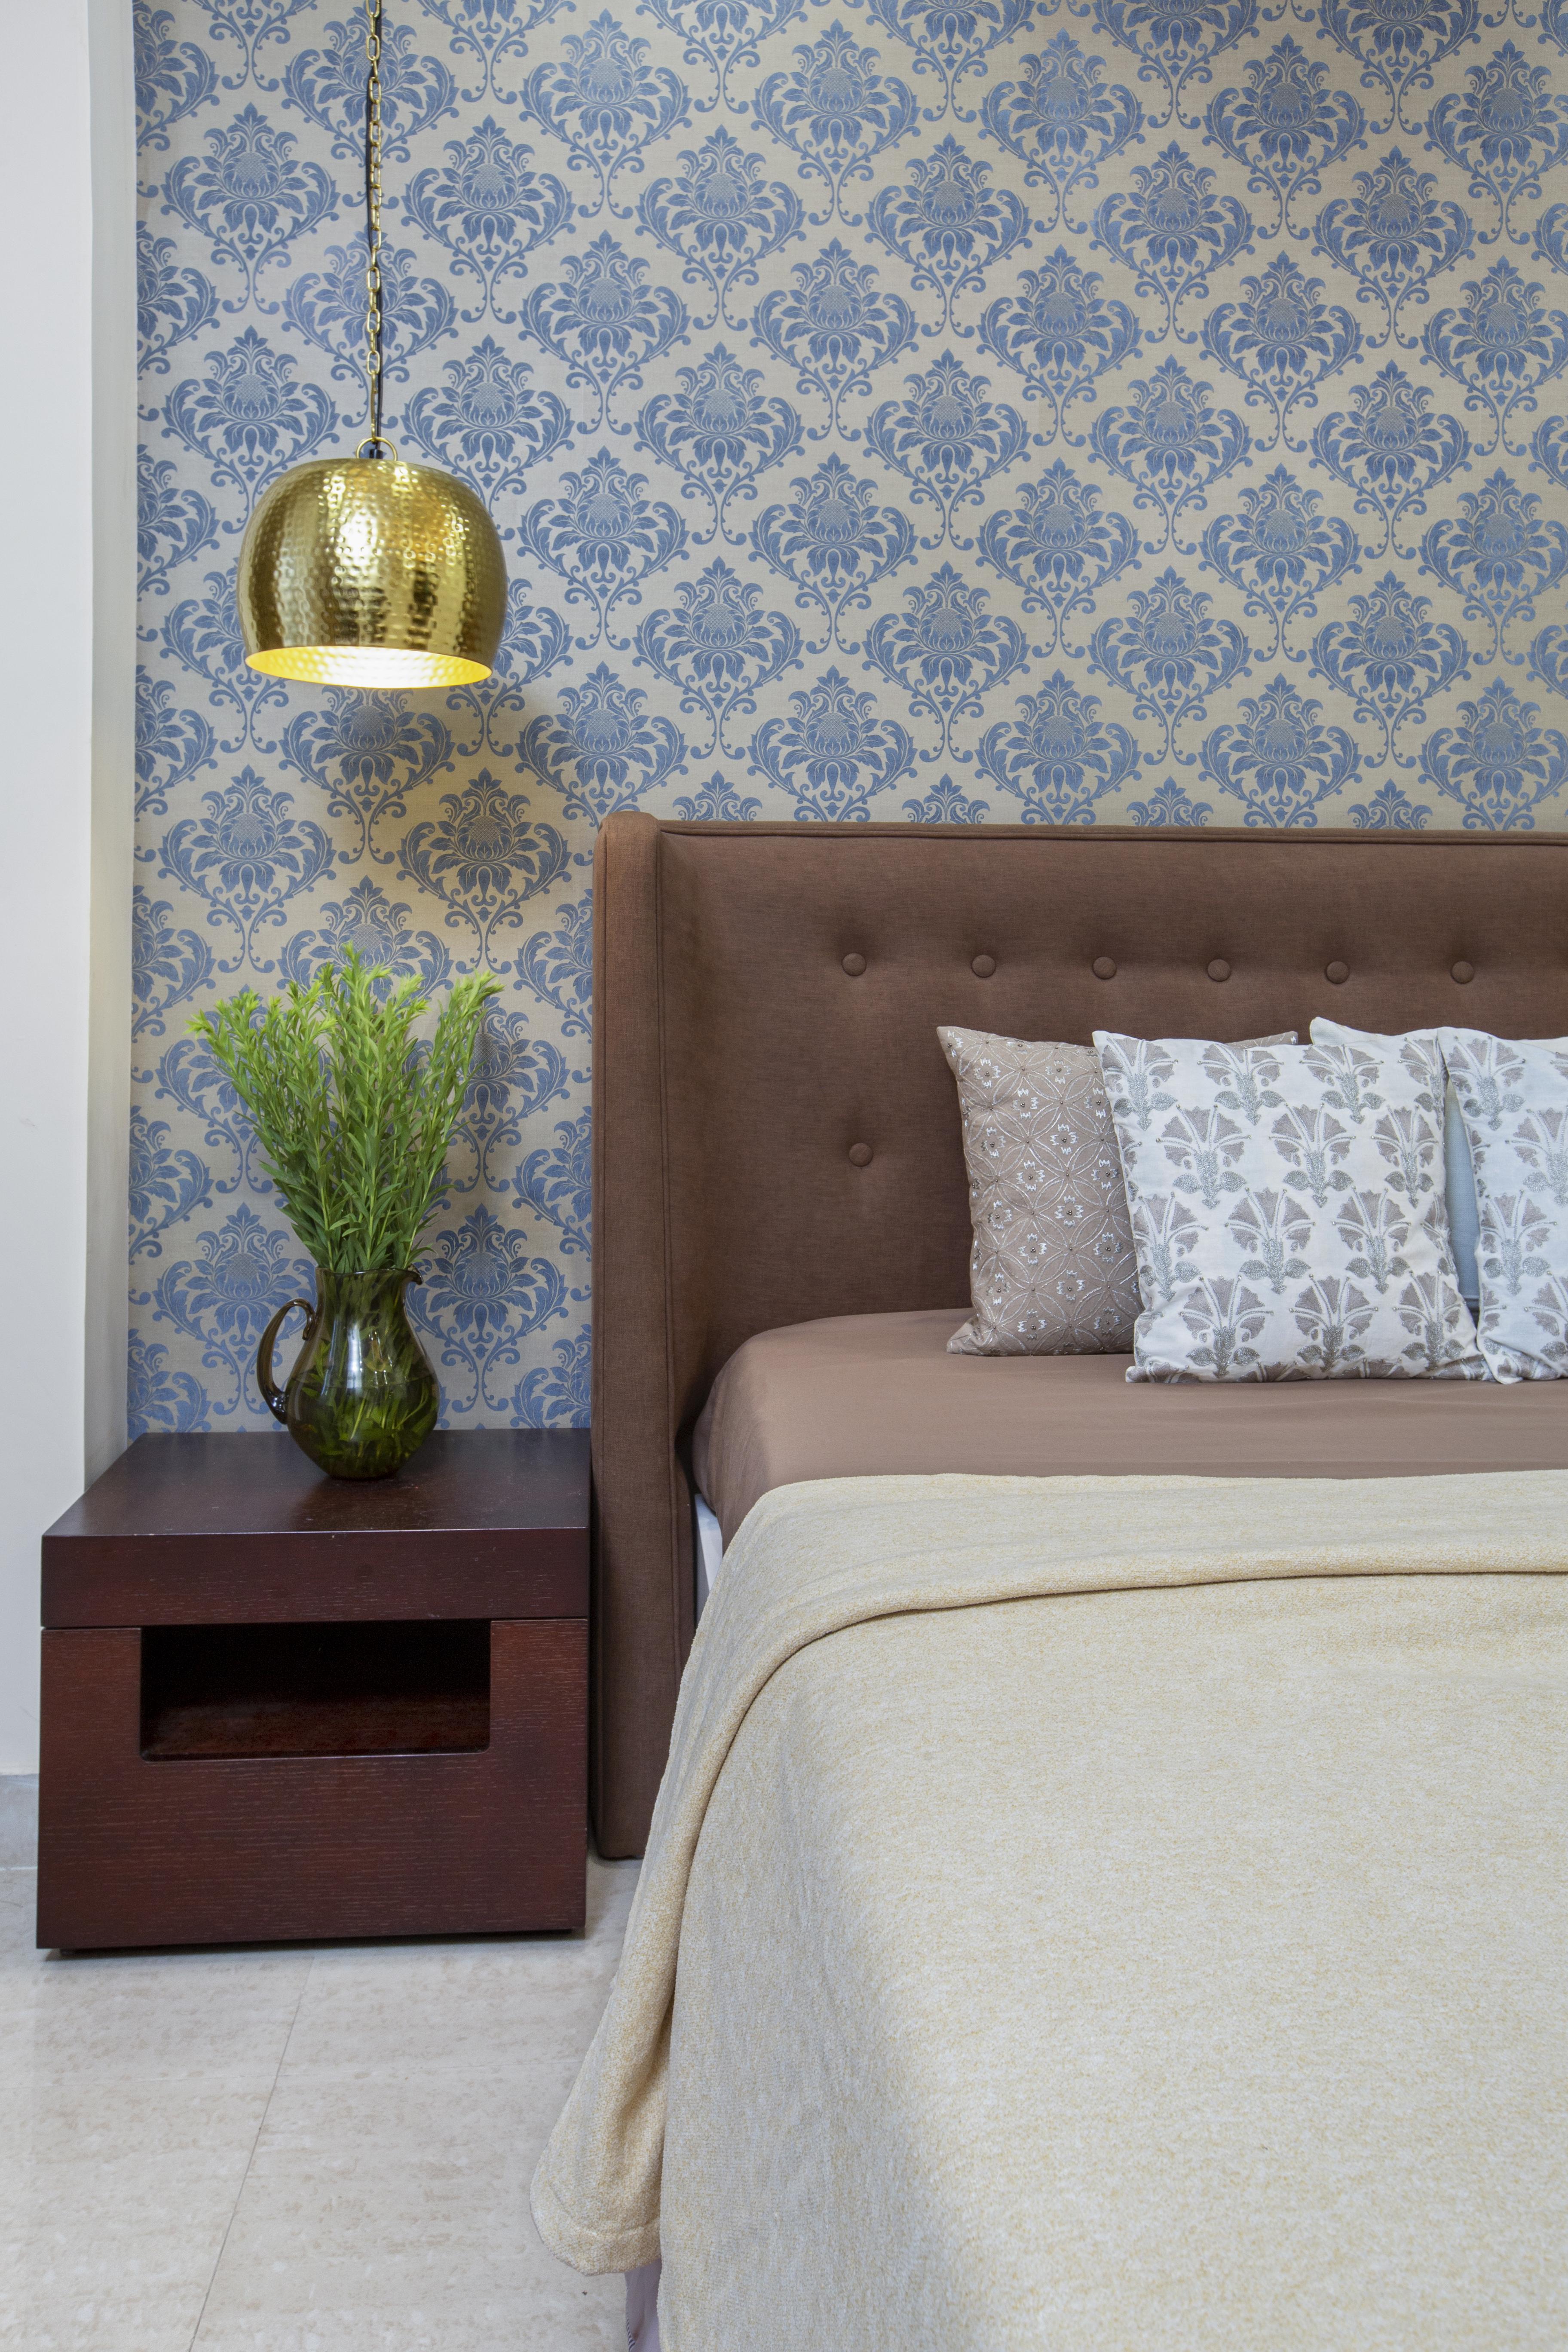 Wallpaper tips Homes Under Budget HUB